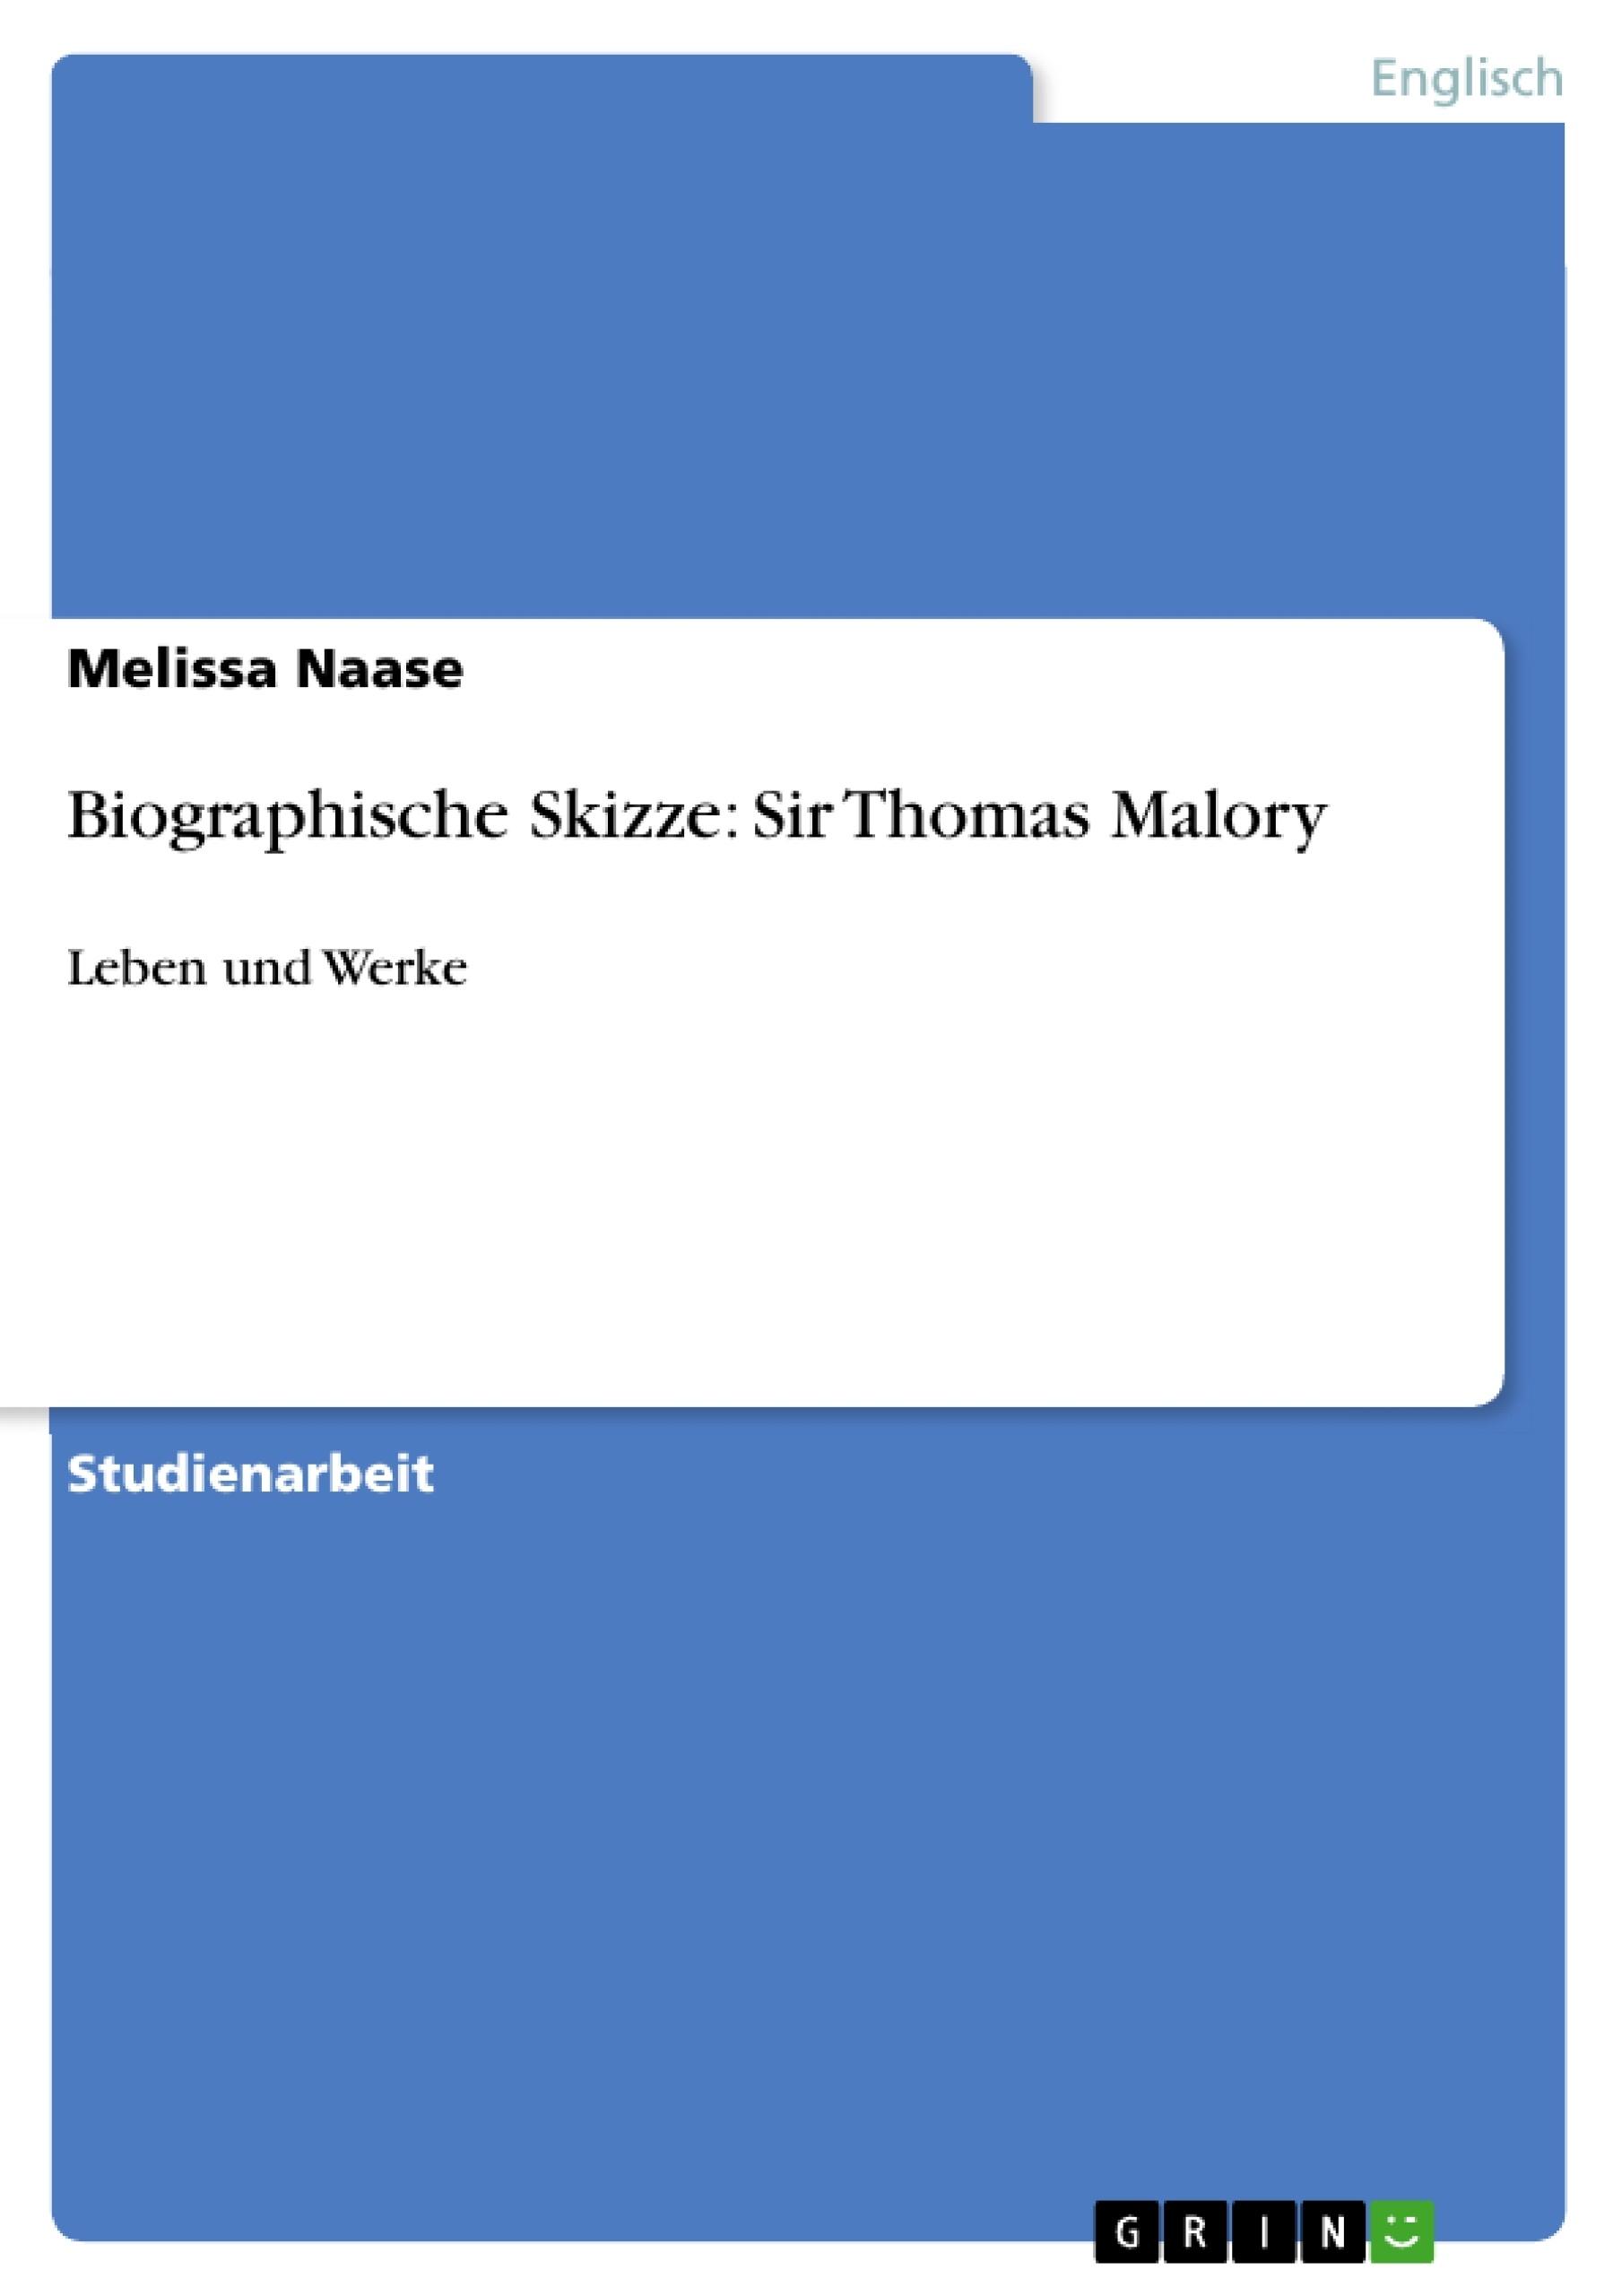 Titel: Biographische Skizze: Sir Thomas Malory